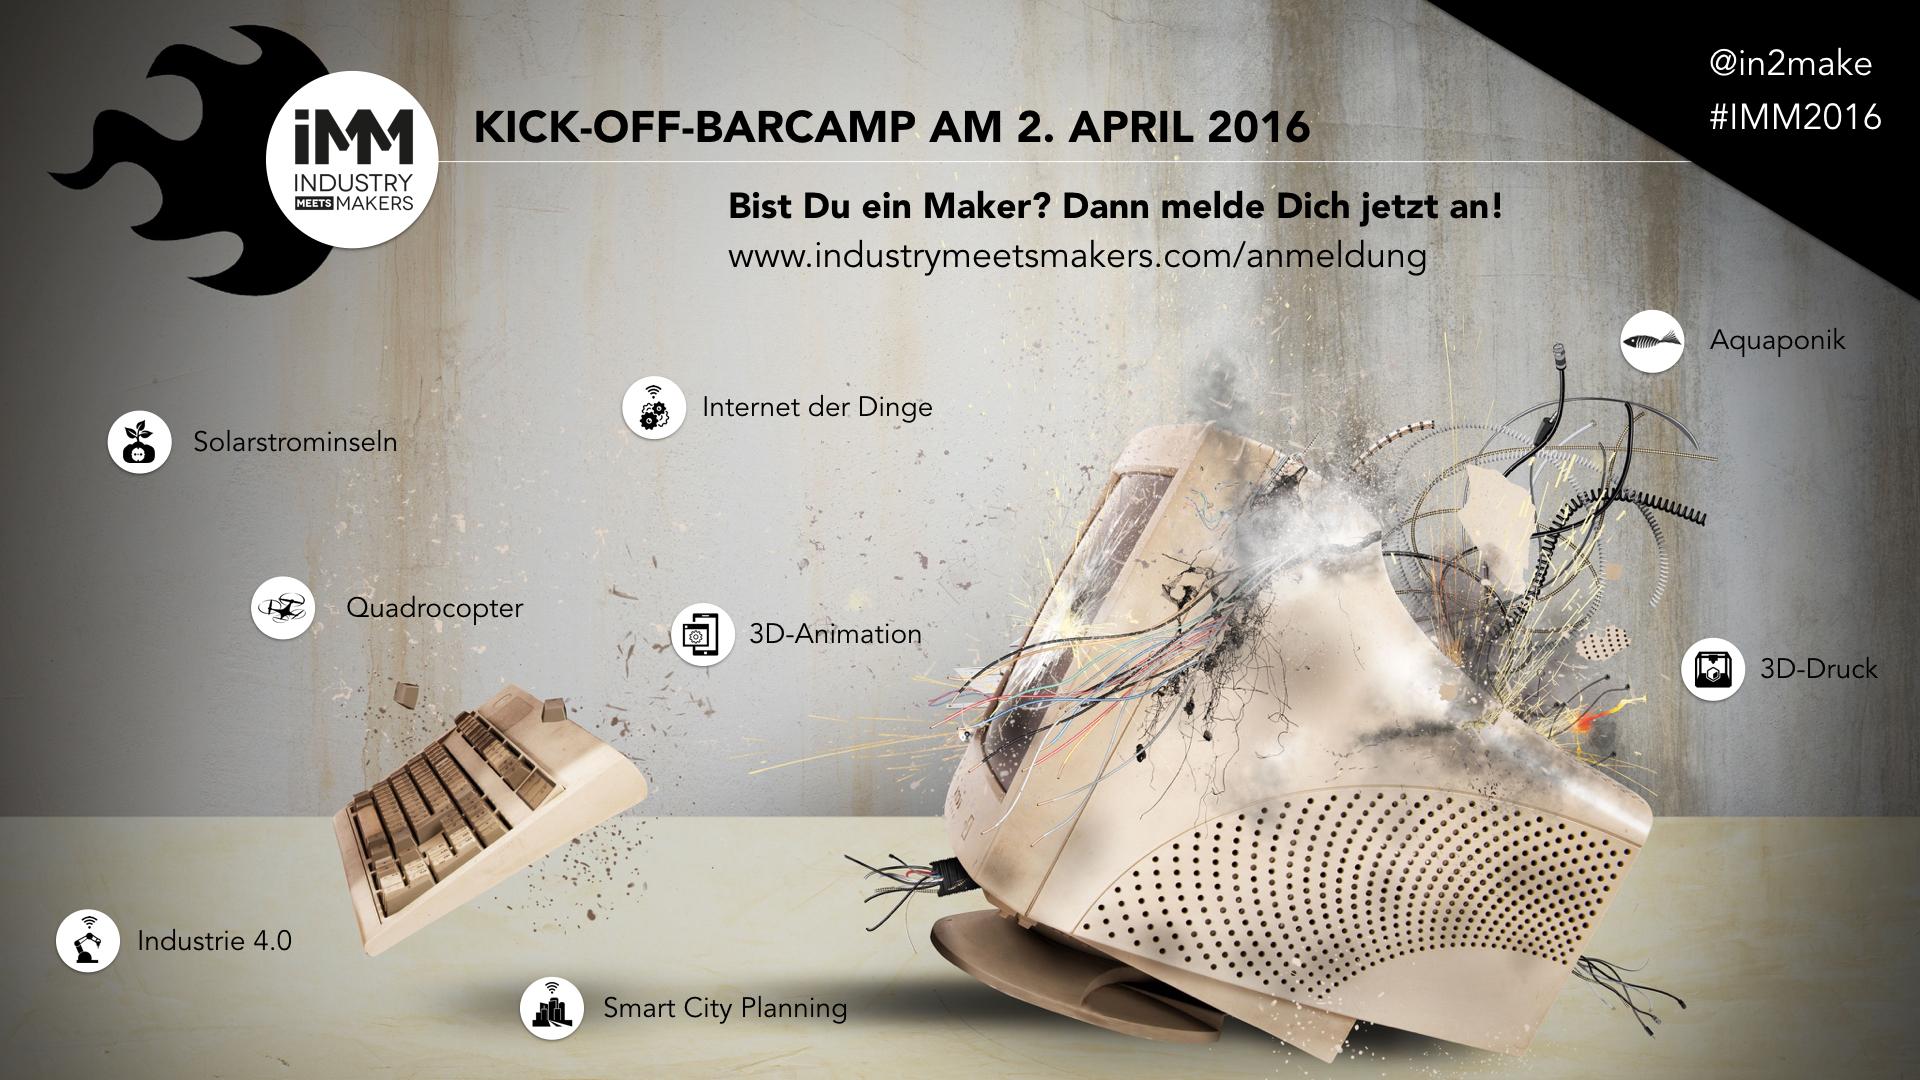 Industry meets Makers Kick-off-Barcamp 2.4.2016